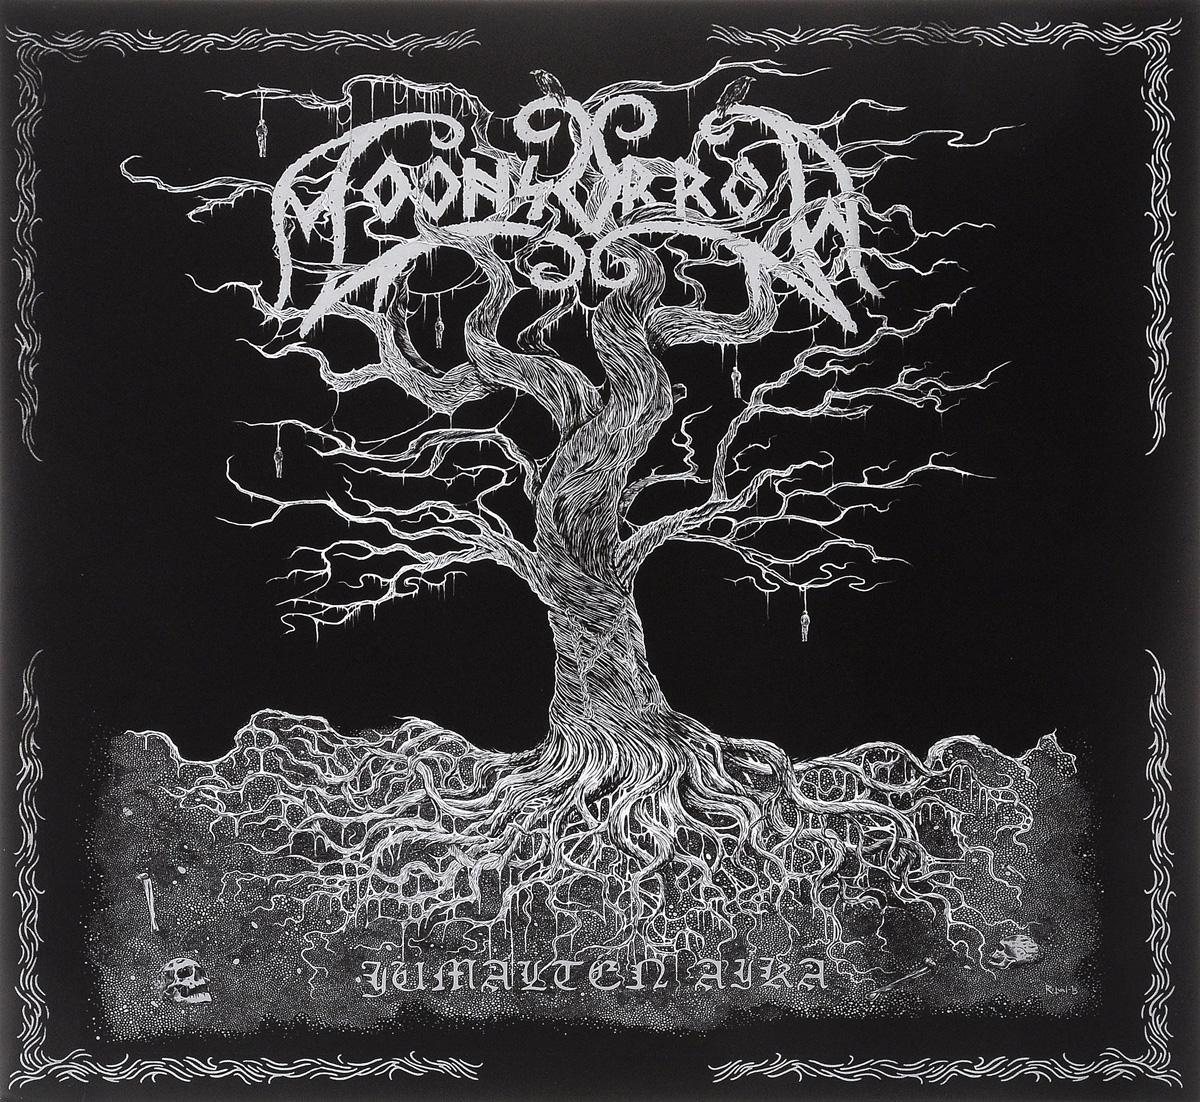 Moonsorrow Moonsorrow. Jumalten Aika (2 LP + CD) ���������� �������������� ���������� �������������� �������� �������������������� ������������������������ ���������������� 1 2 3 ������������ 2 cd